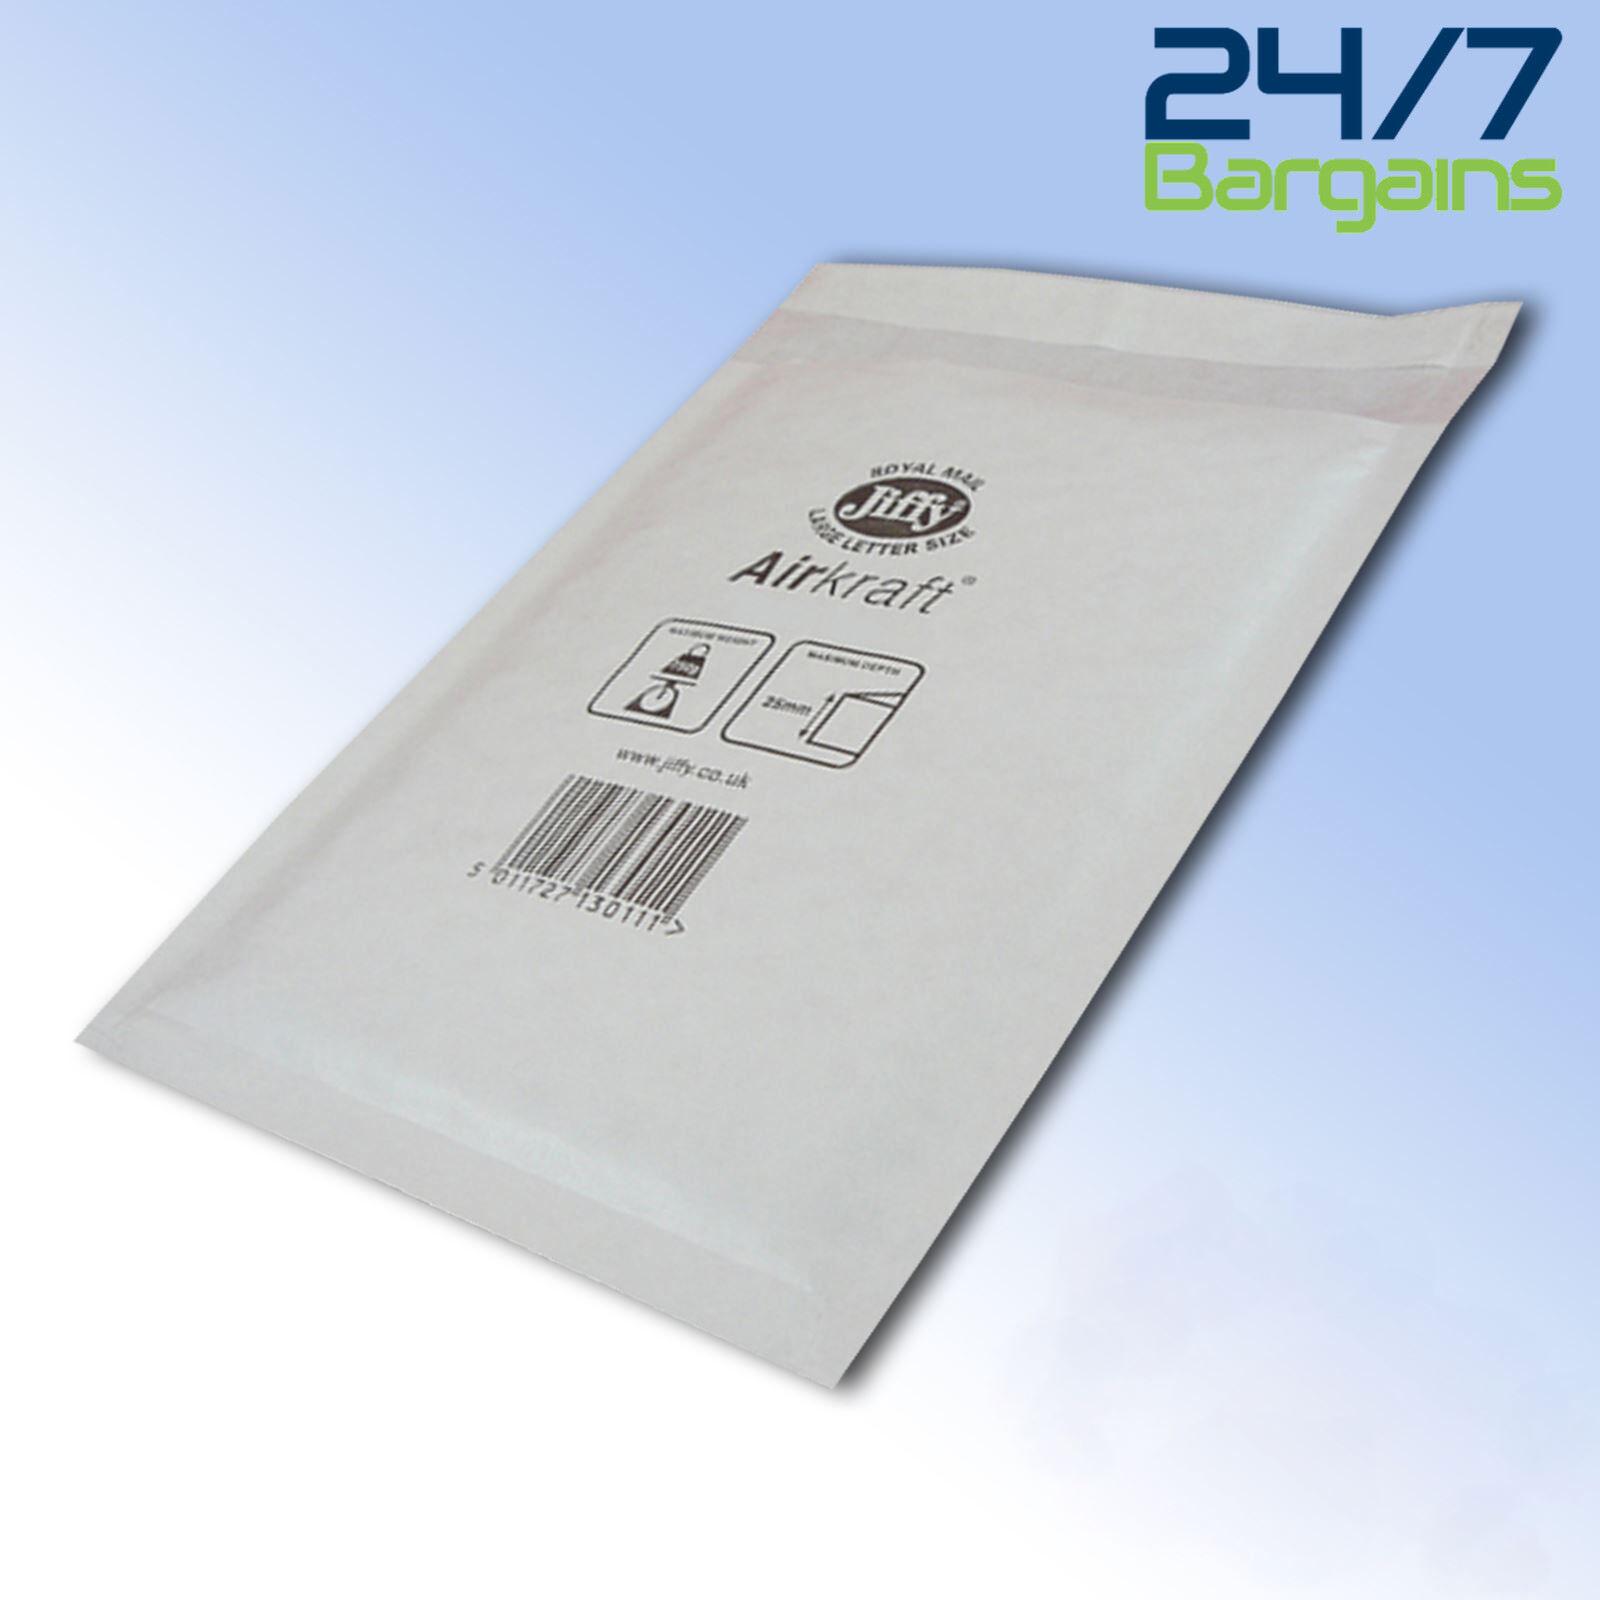 JL0 White 170 x 210mm Bubble Padded JIFFY AIRKRAFT Postal Bag Envelope